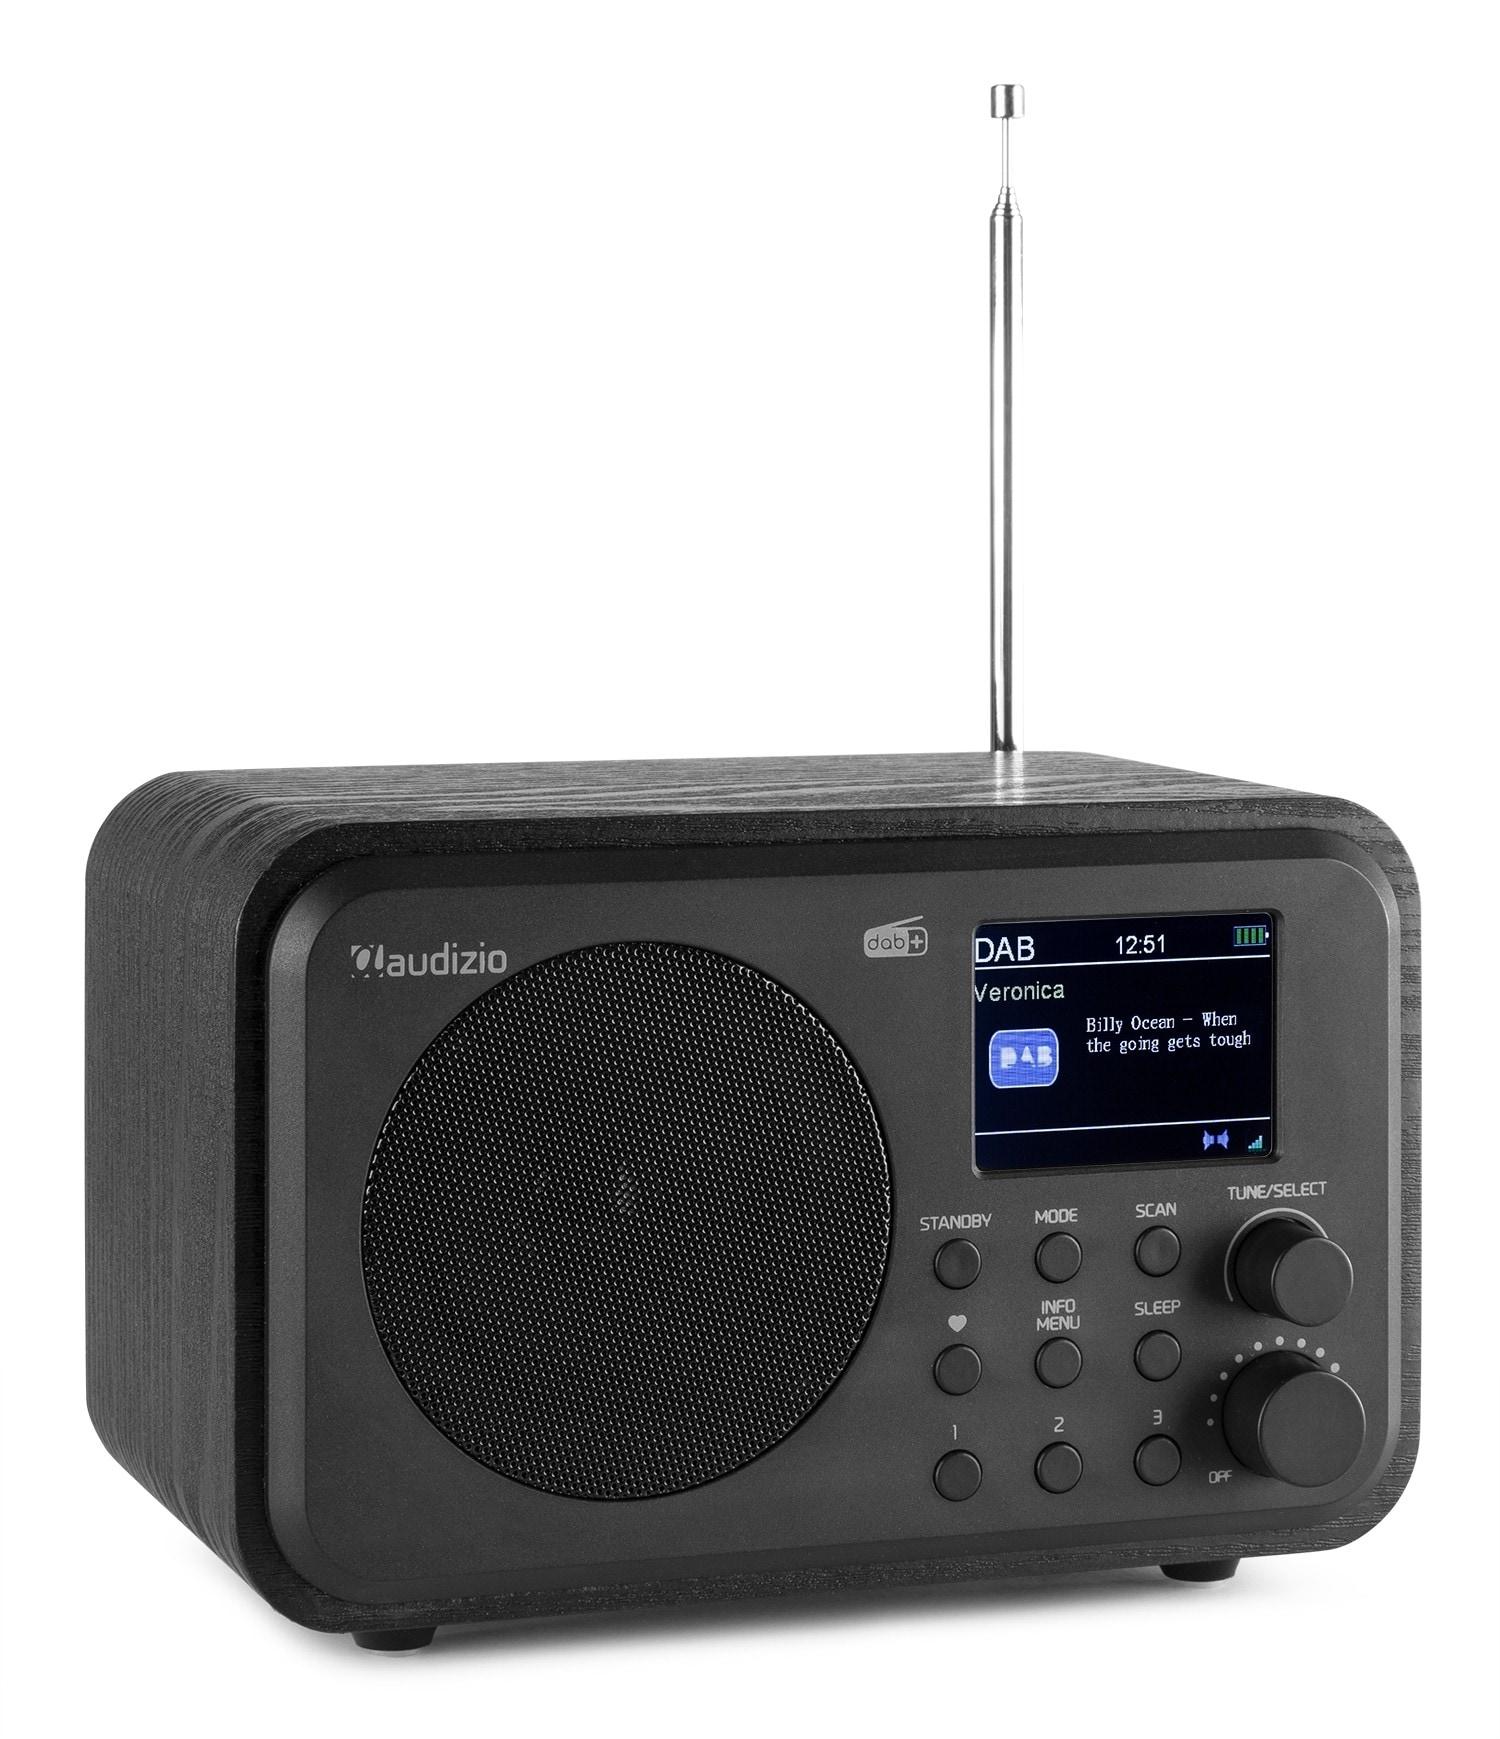 audizio Milan DAB, radio med batteri, Svart